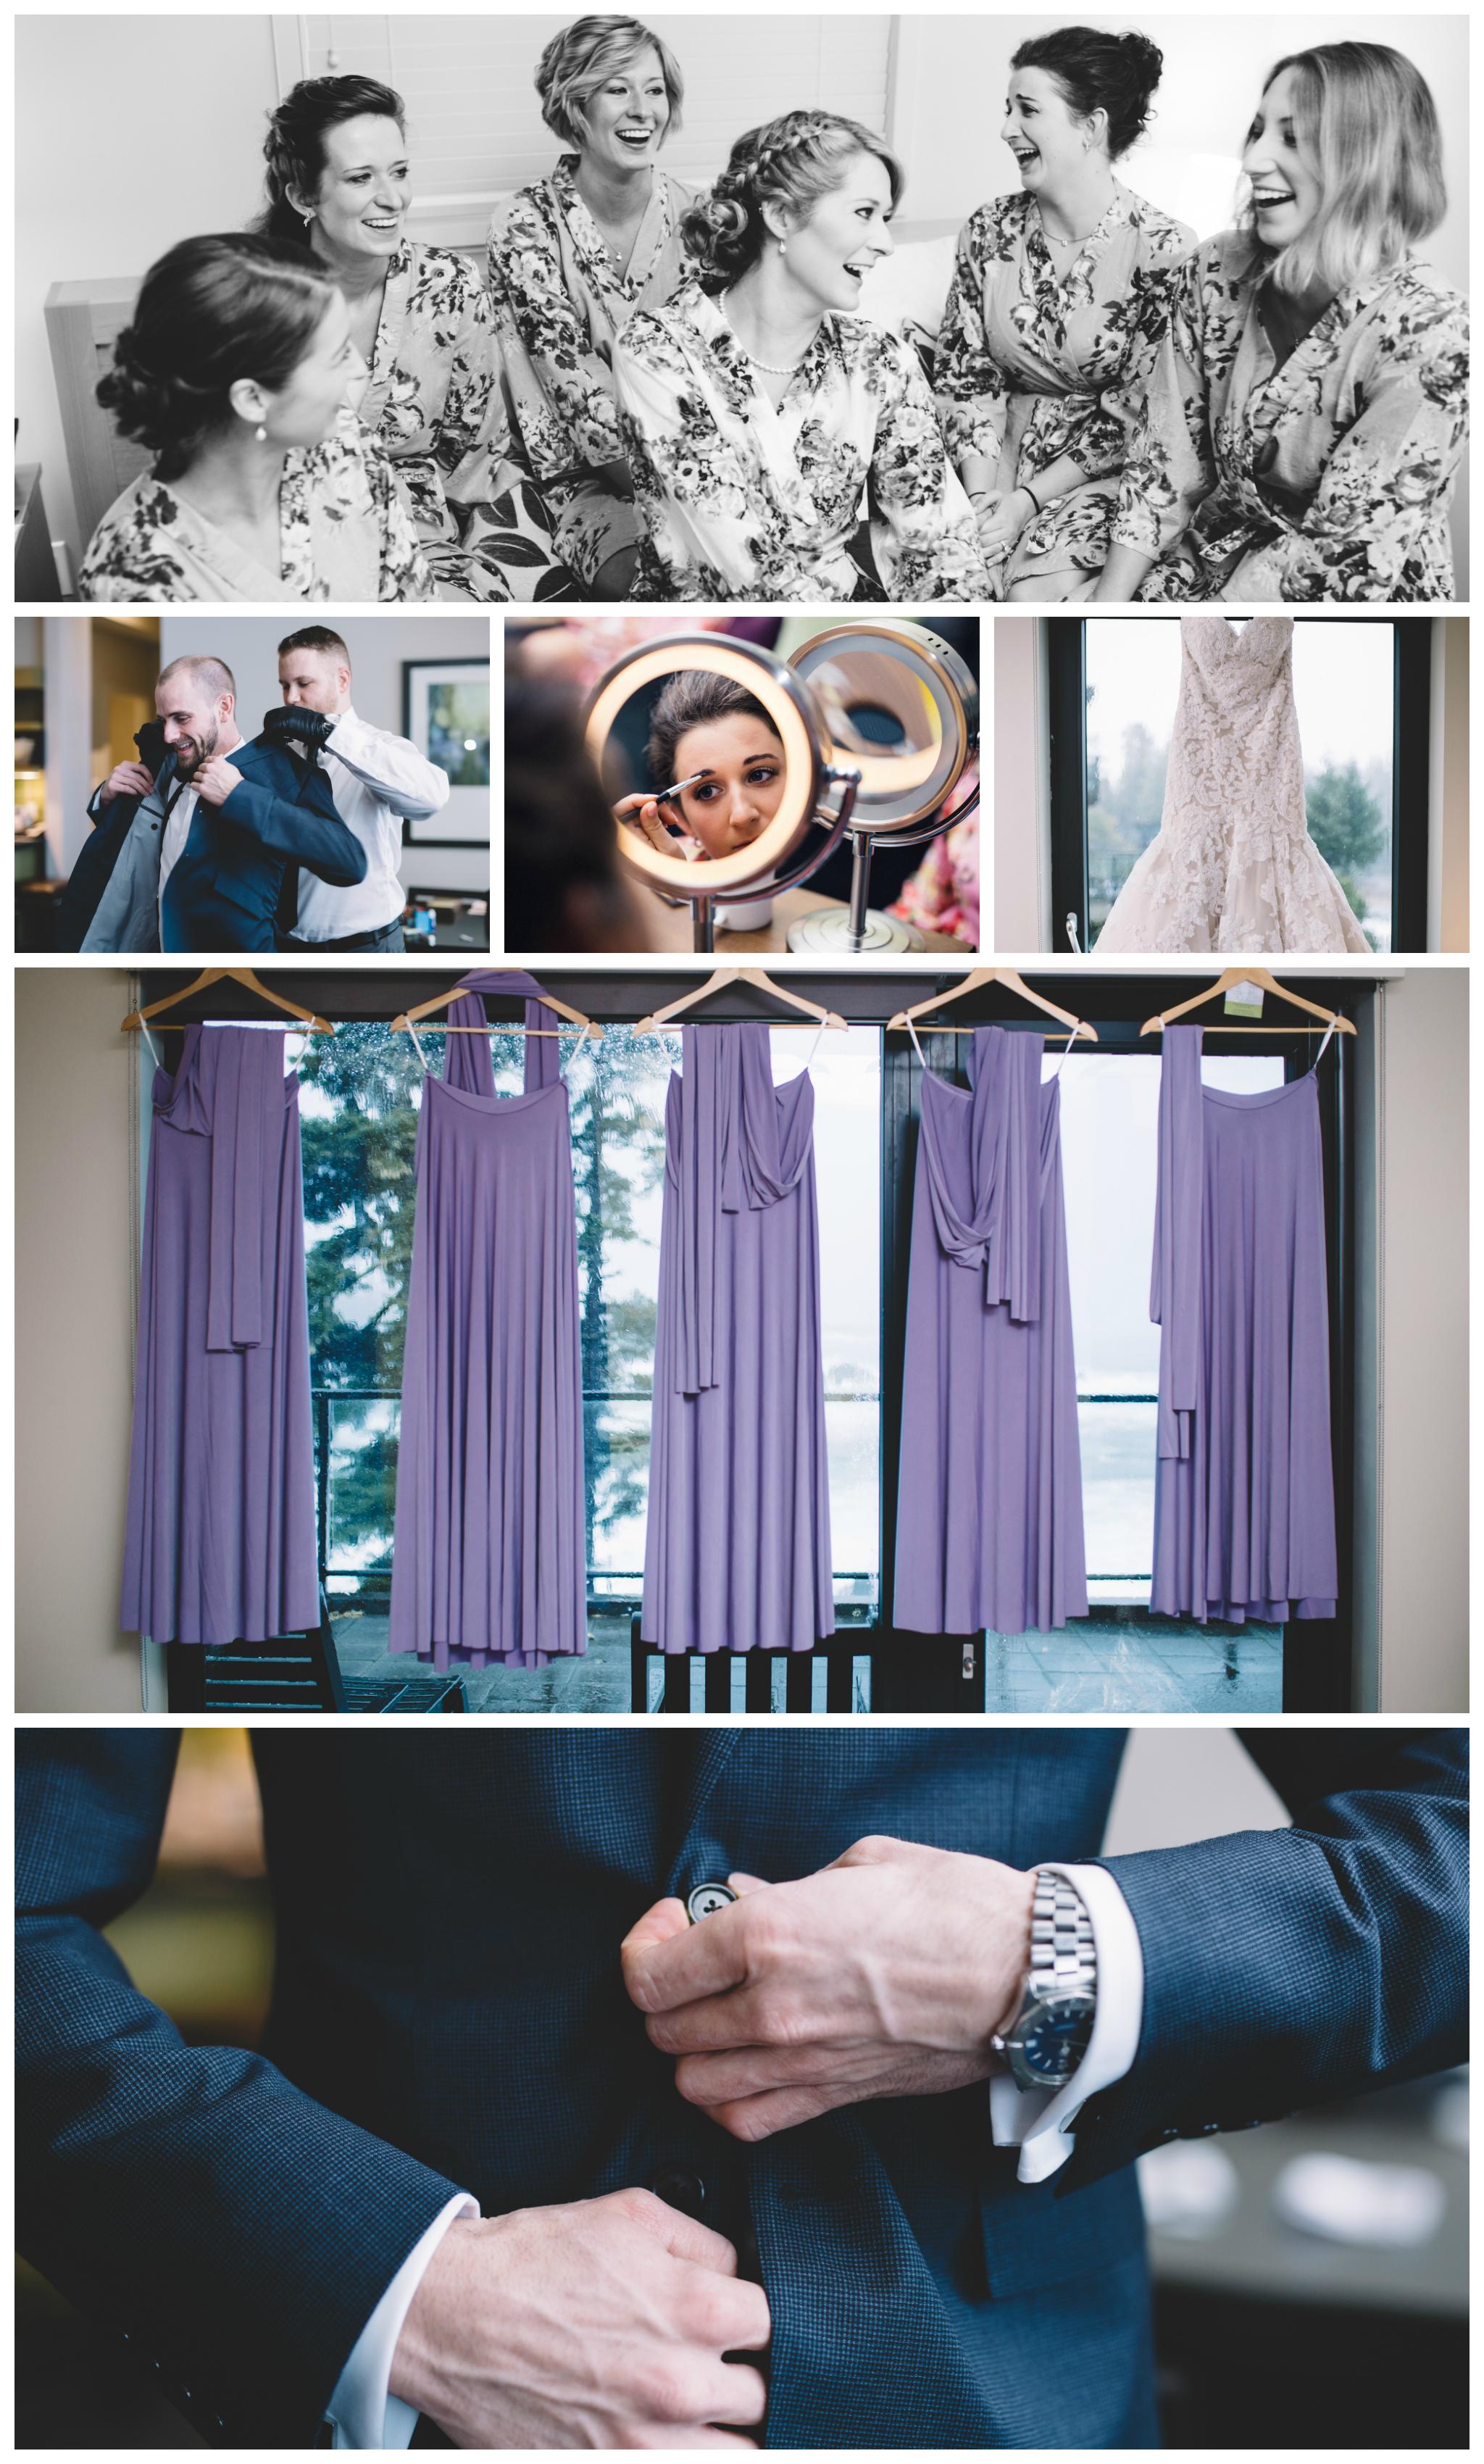 frick-wedding-3.jpg